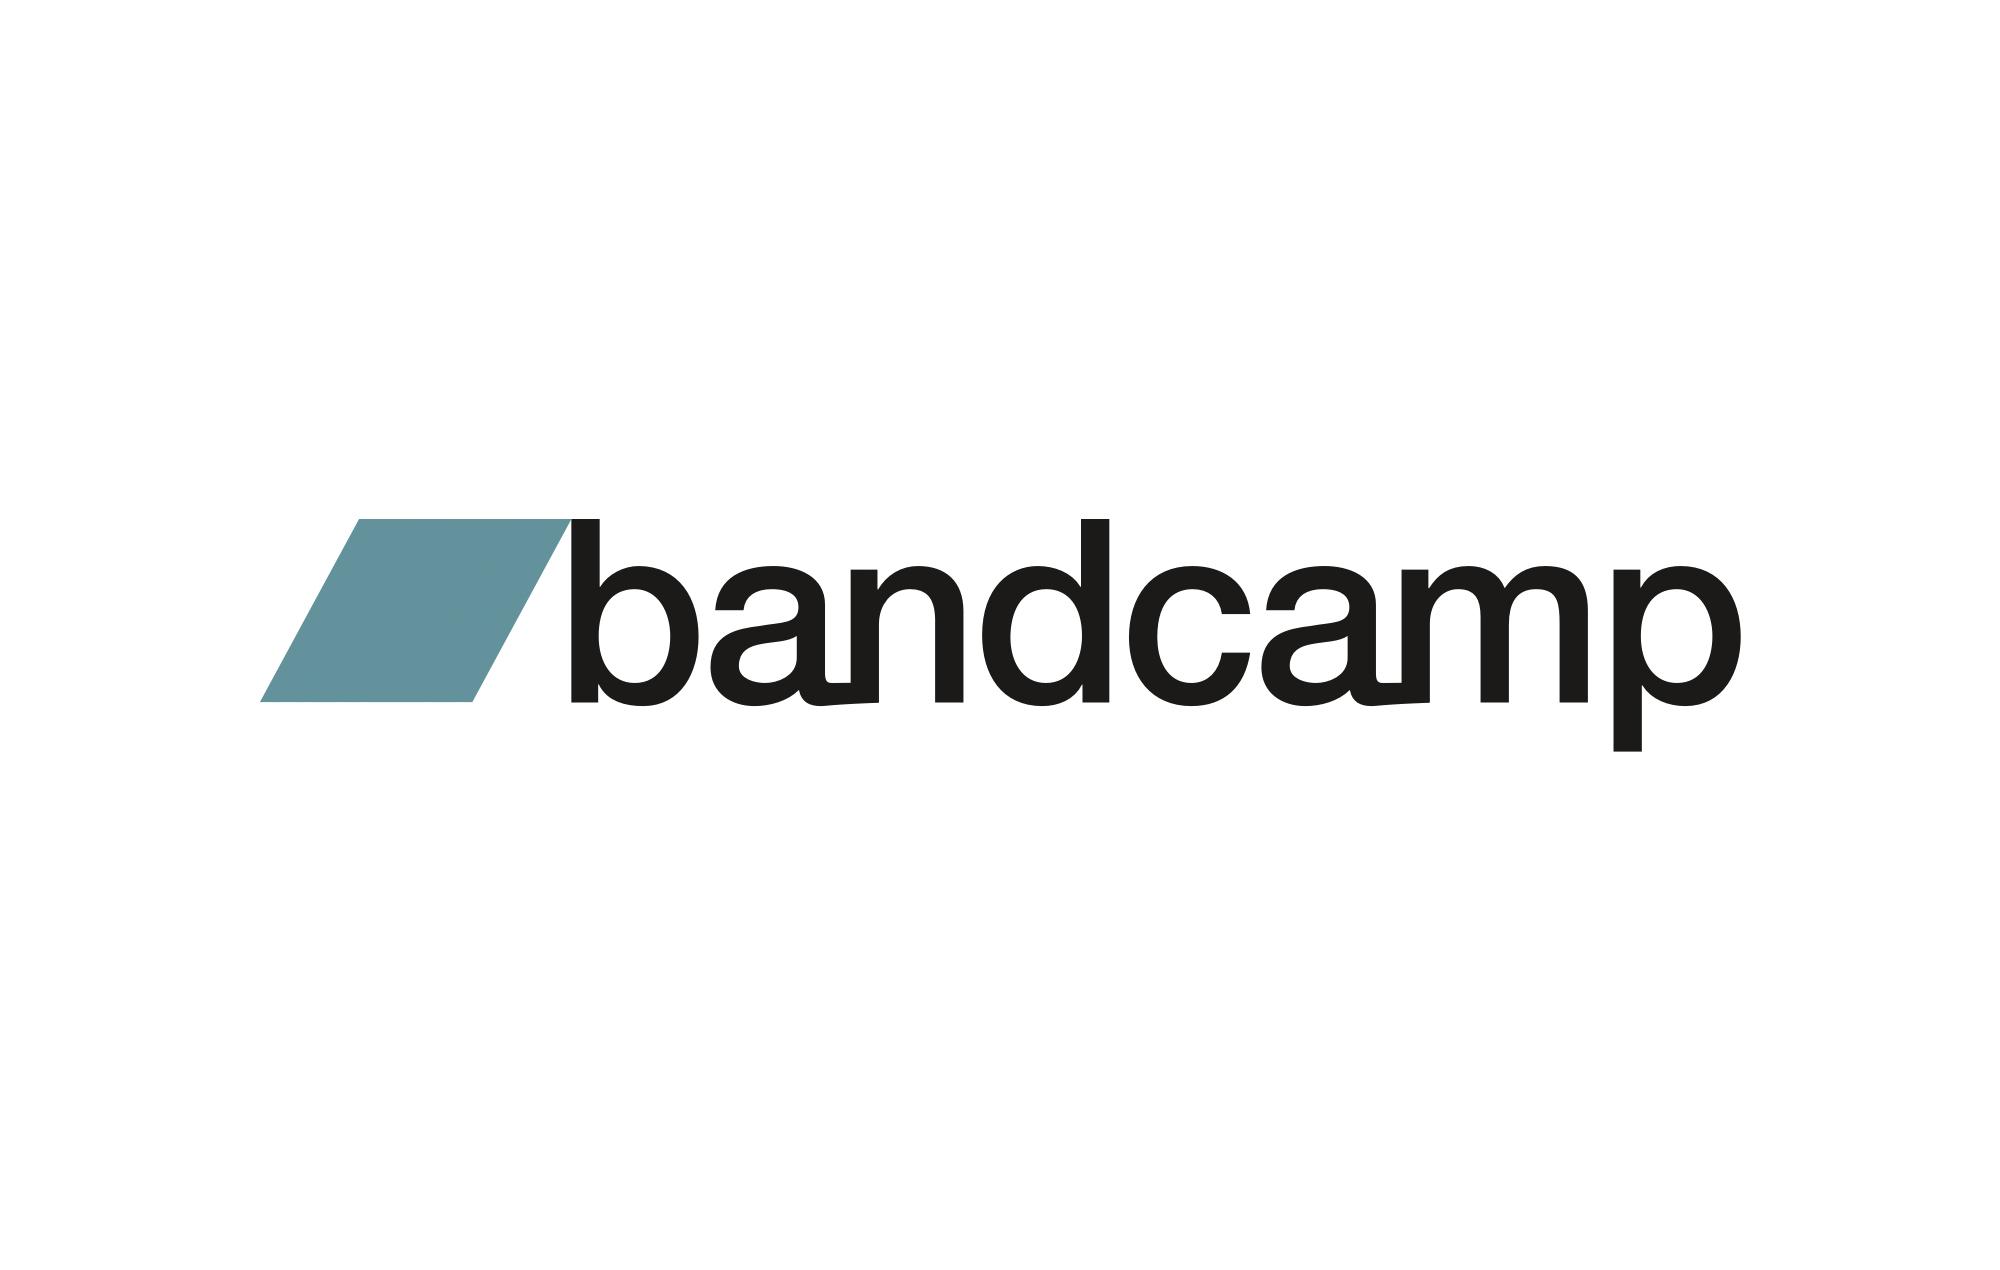 sergei tumanov on bandcamp